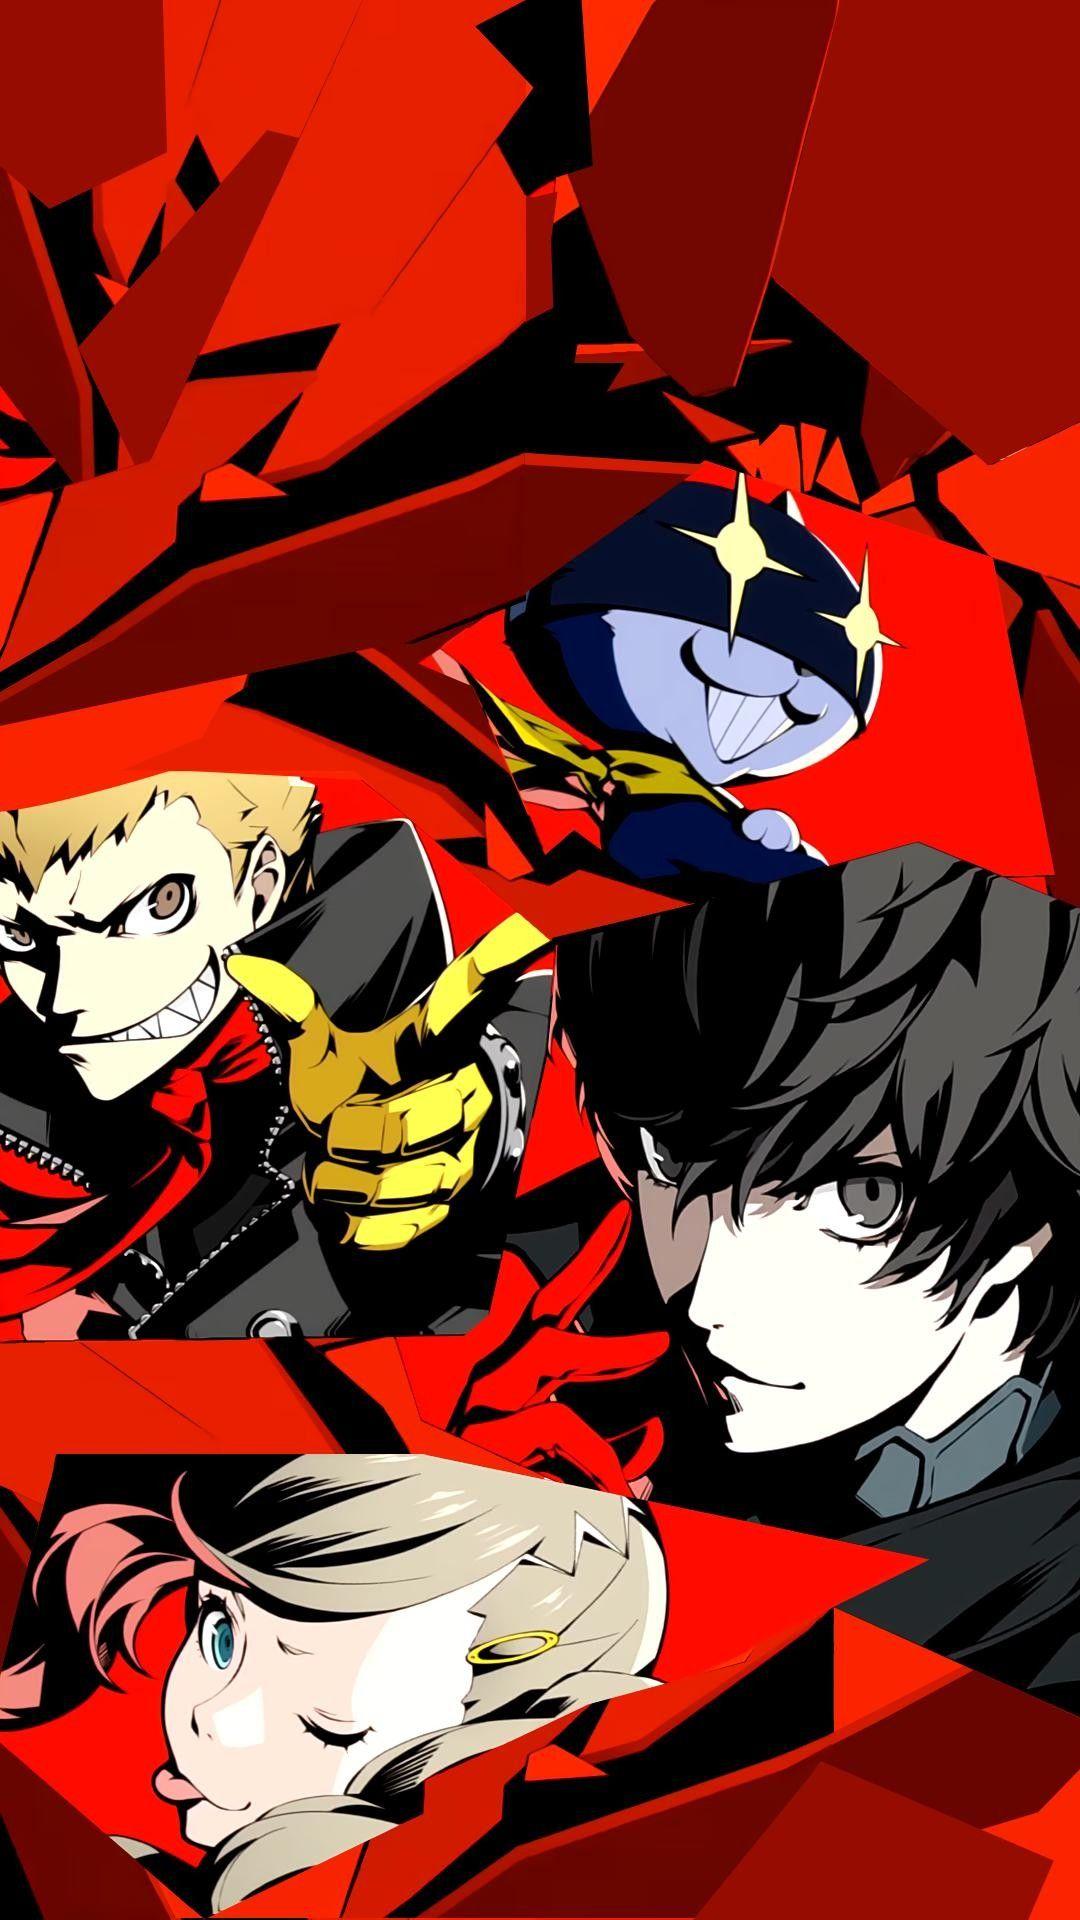 Persona 5 Take Your Heart Phone Wallpaper In 2020 Persona 5 Joker Persona 5 Anime Persona 5